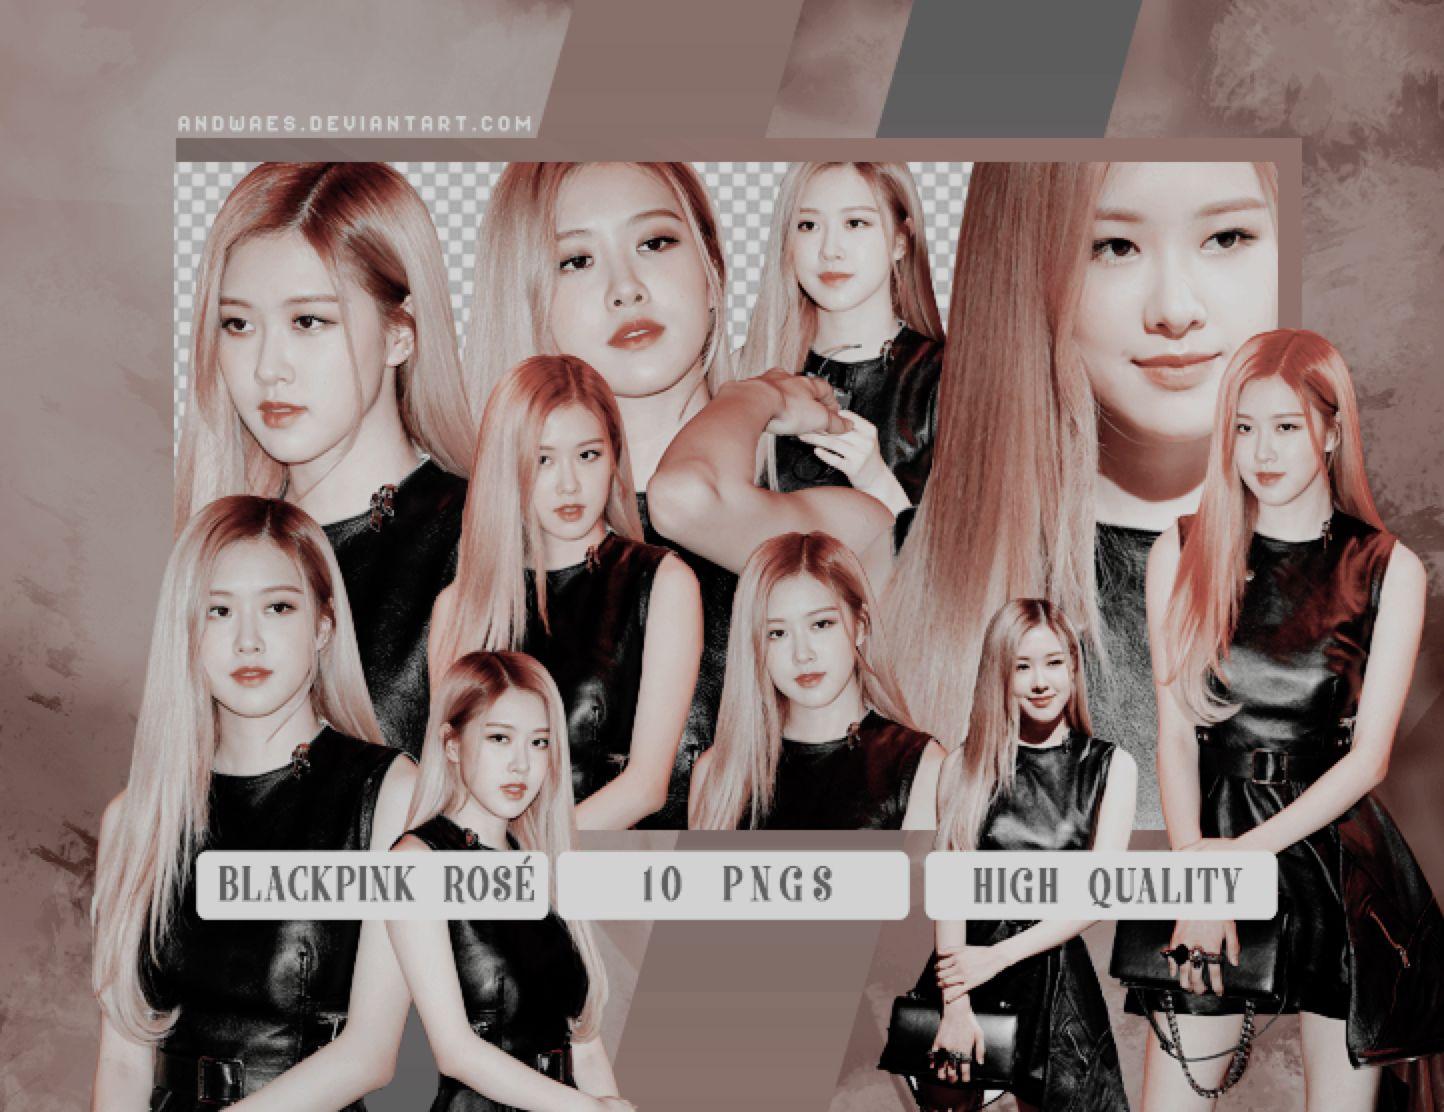 Blackpink Roseanne Chaeyoung Pngs Renders Pack By Andwaes On Deviantart Blackpink Rendering Rose Icon